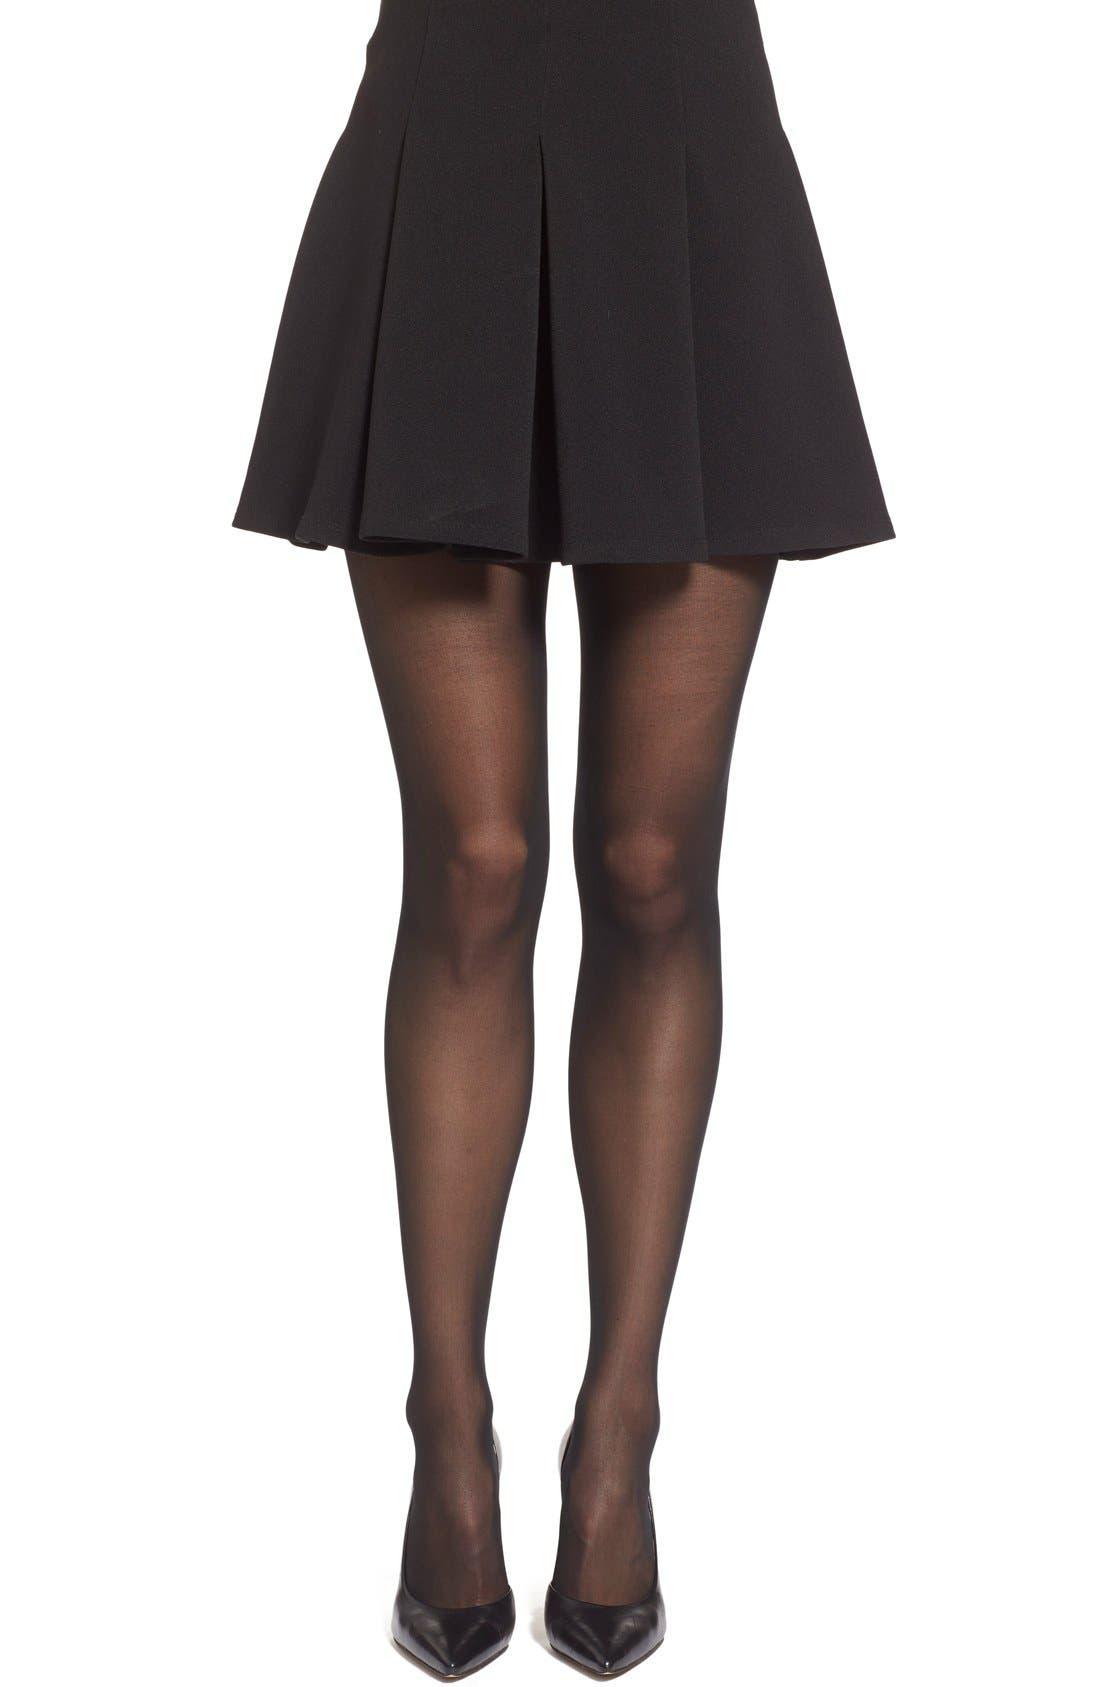 Alternate Image 1 Selected - Falke 'Bijou' Sheer Stockings